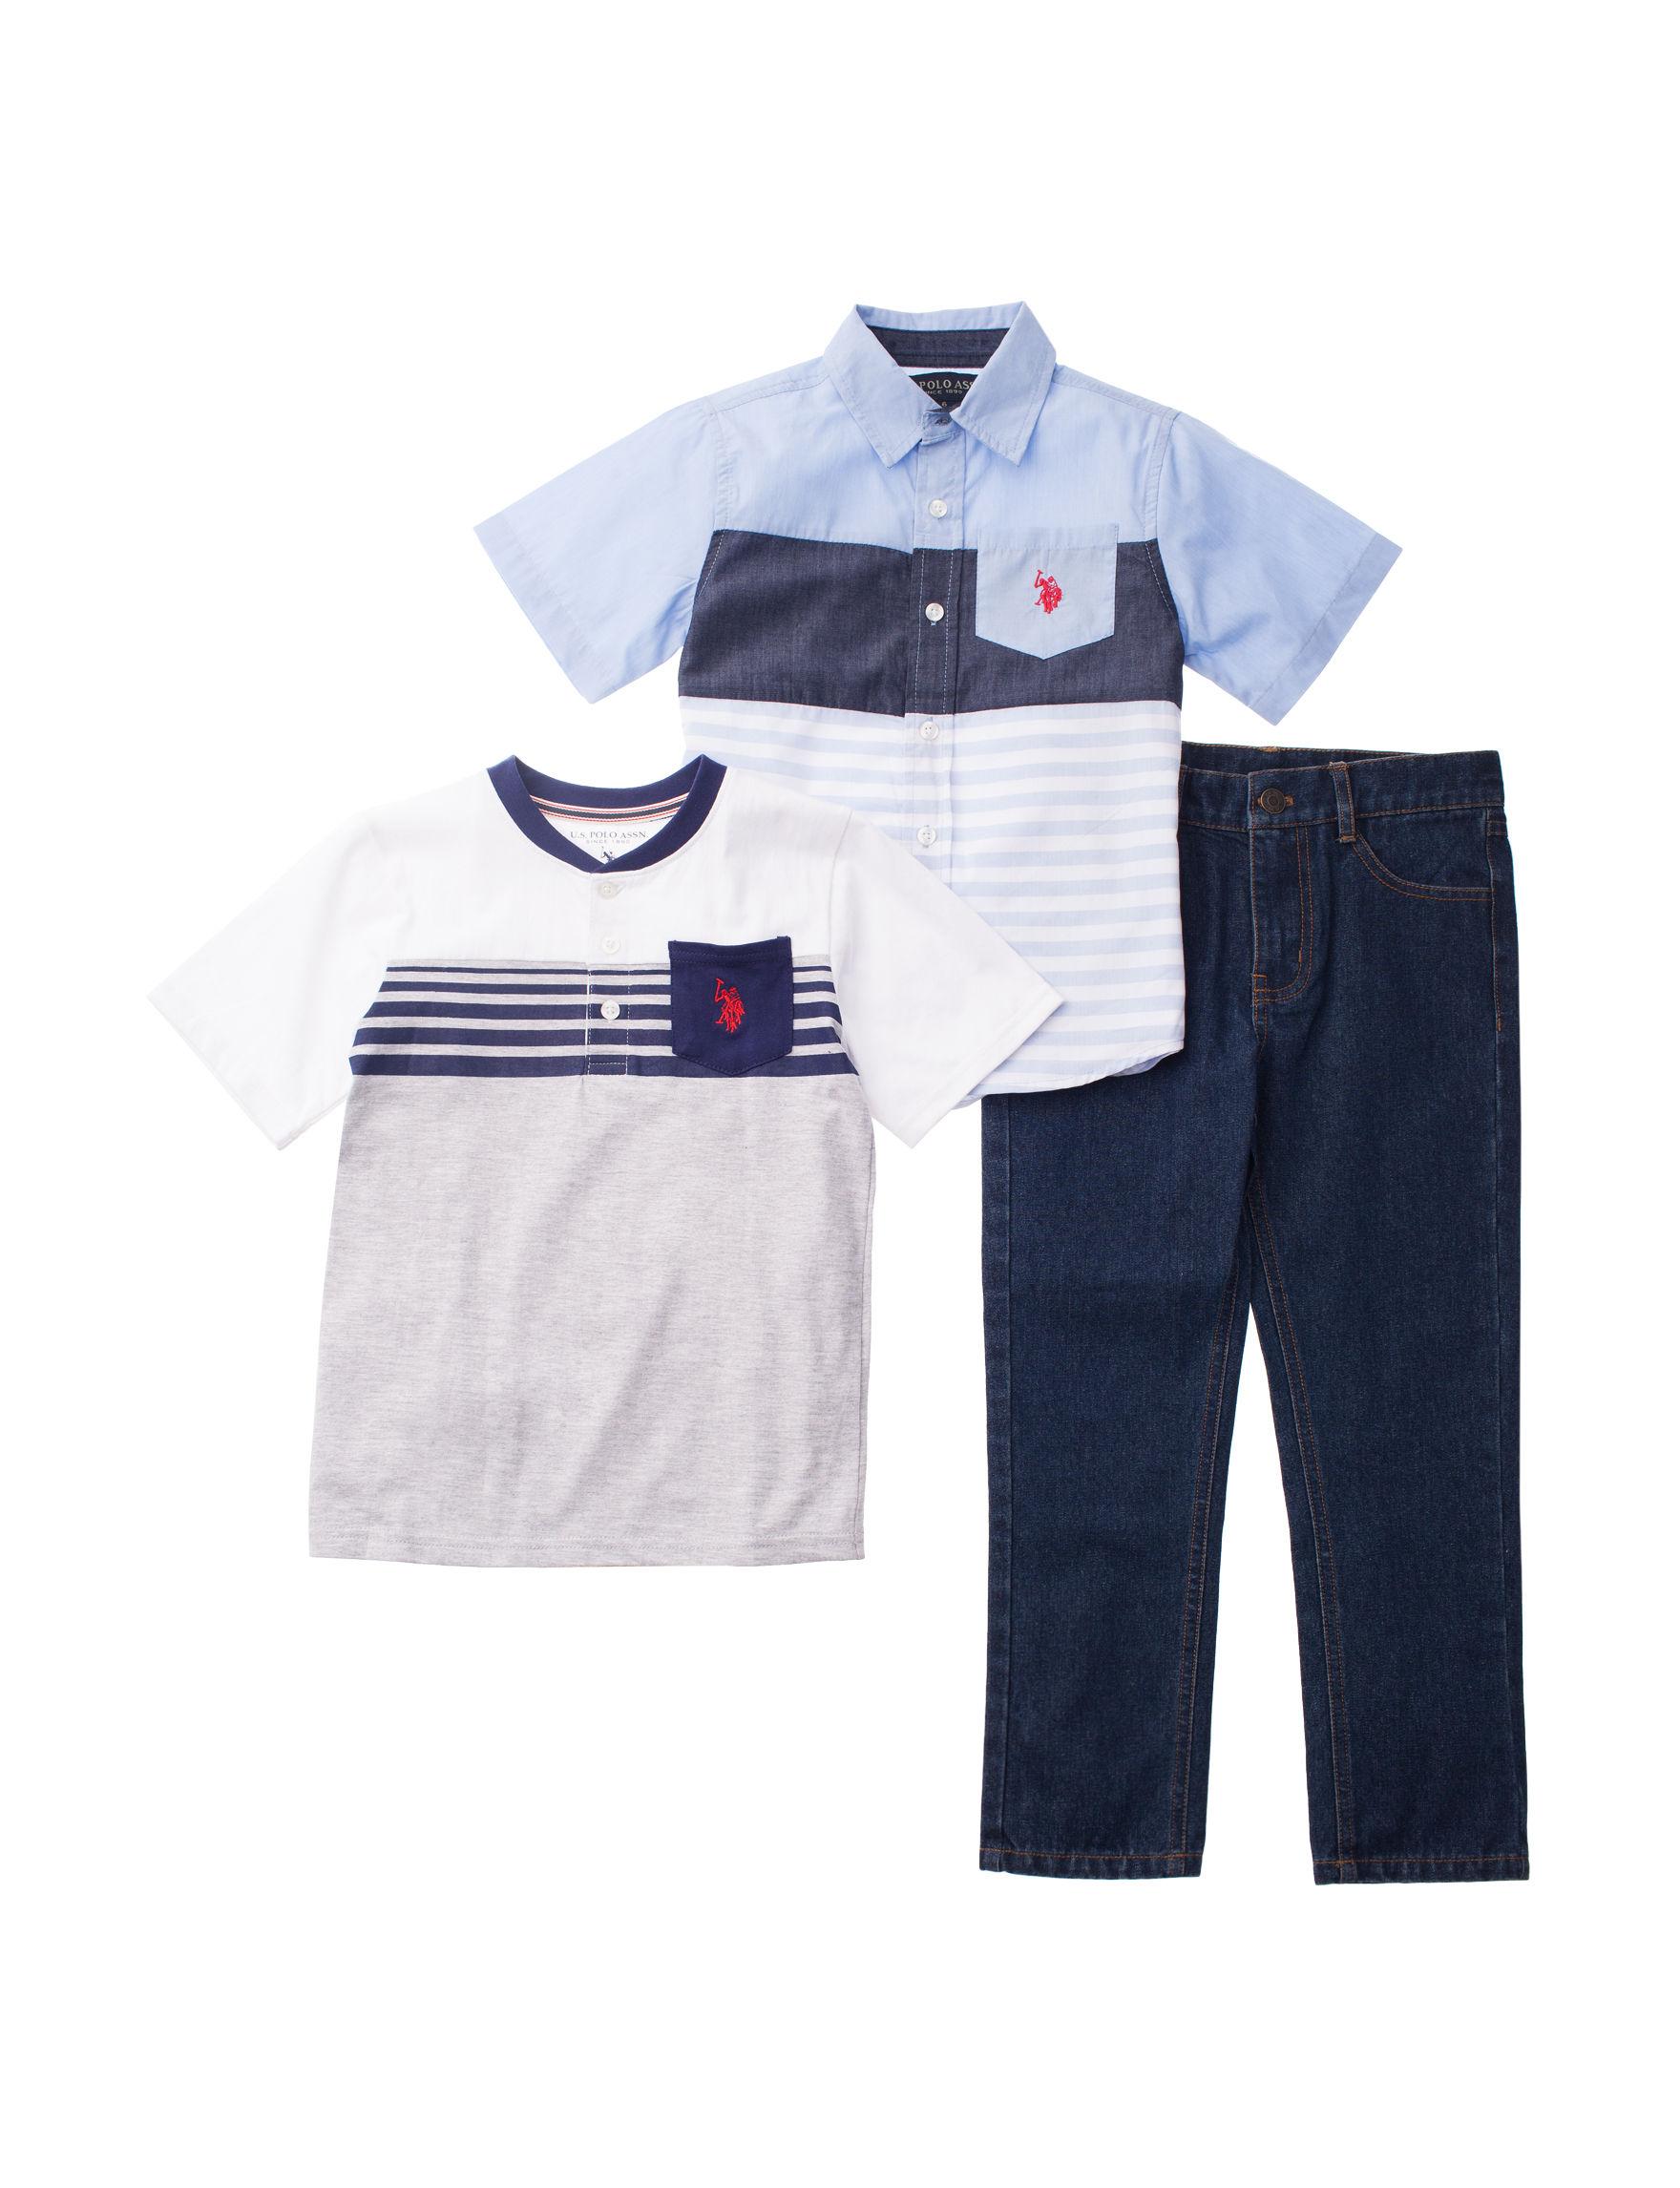 U.S. Polo Assn. Blue / Grey